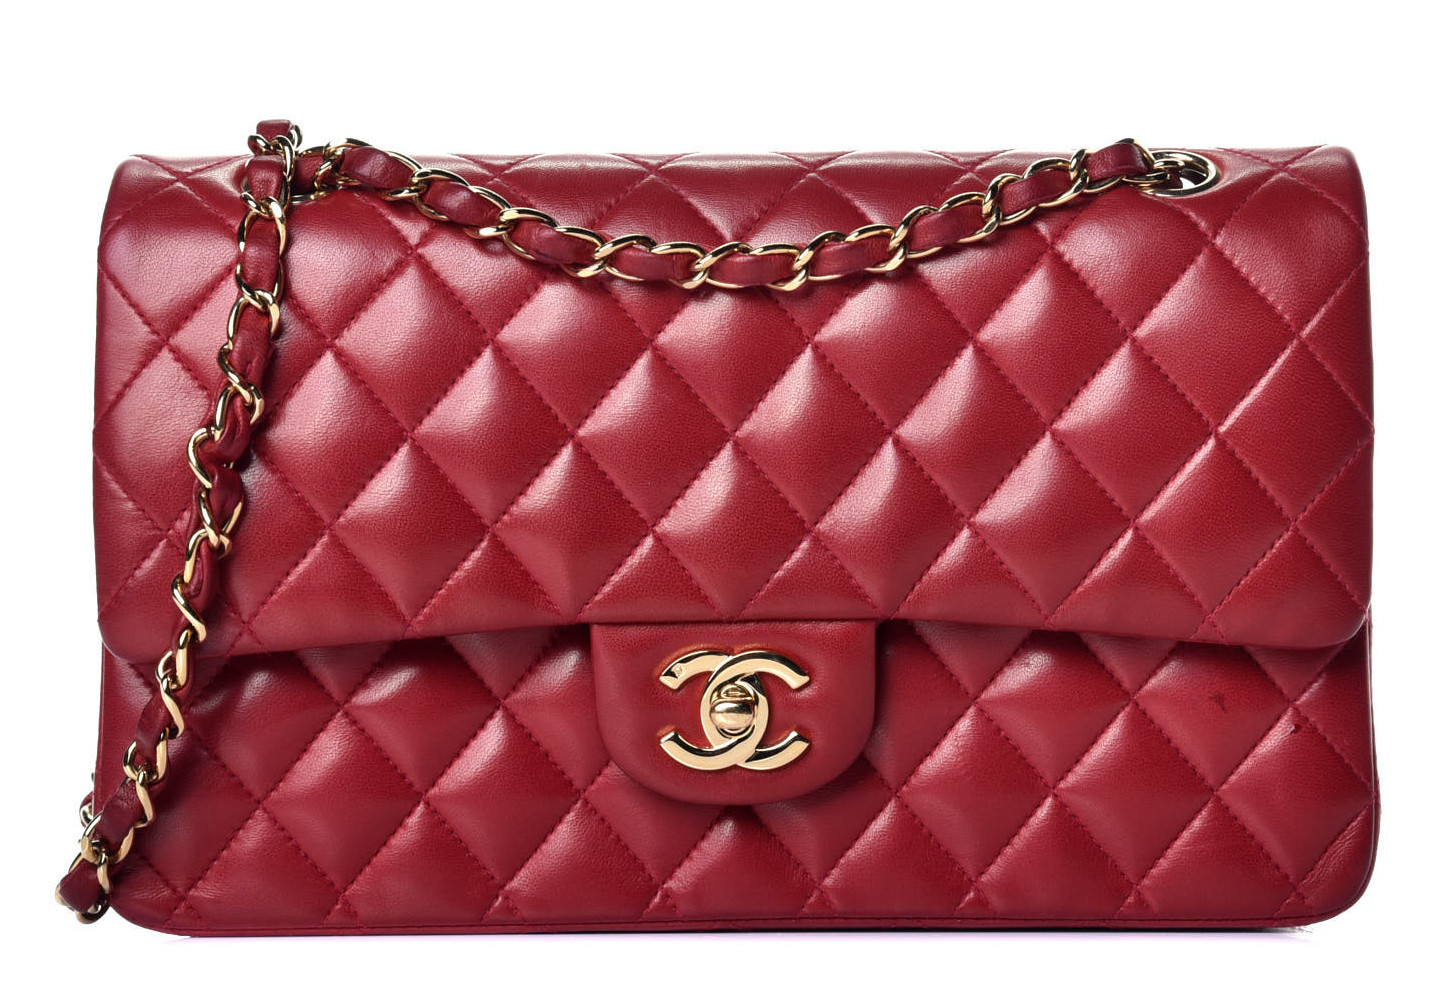 Chanel Lambskin Medium Red Classic Flap